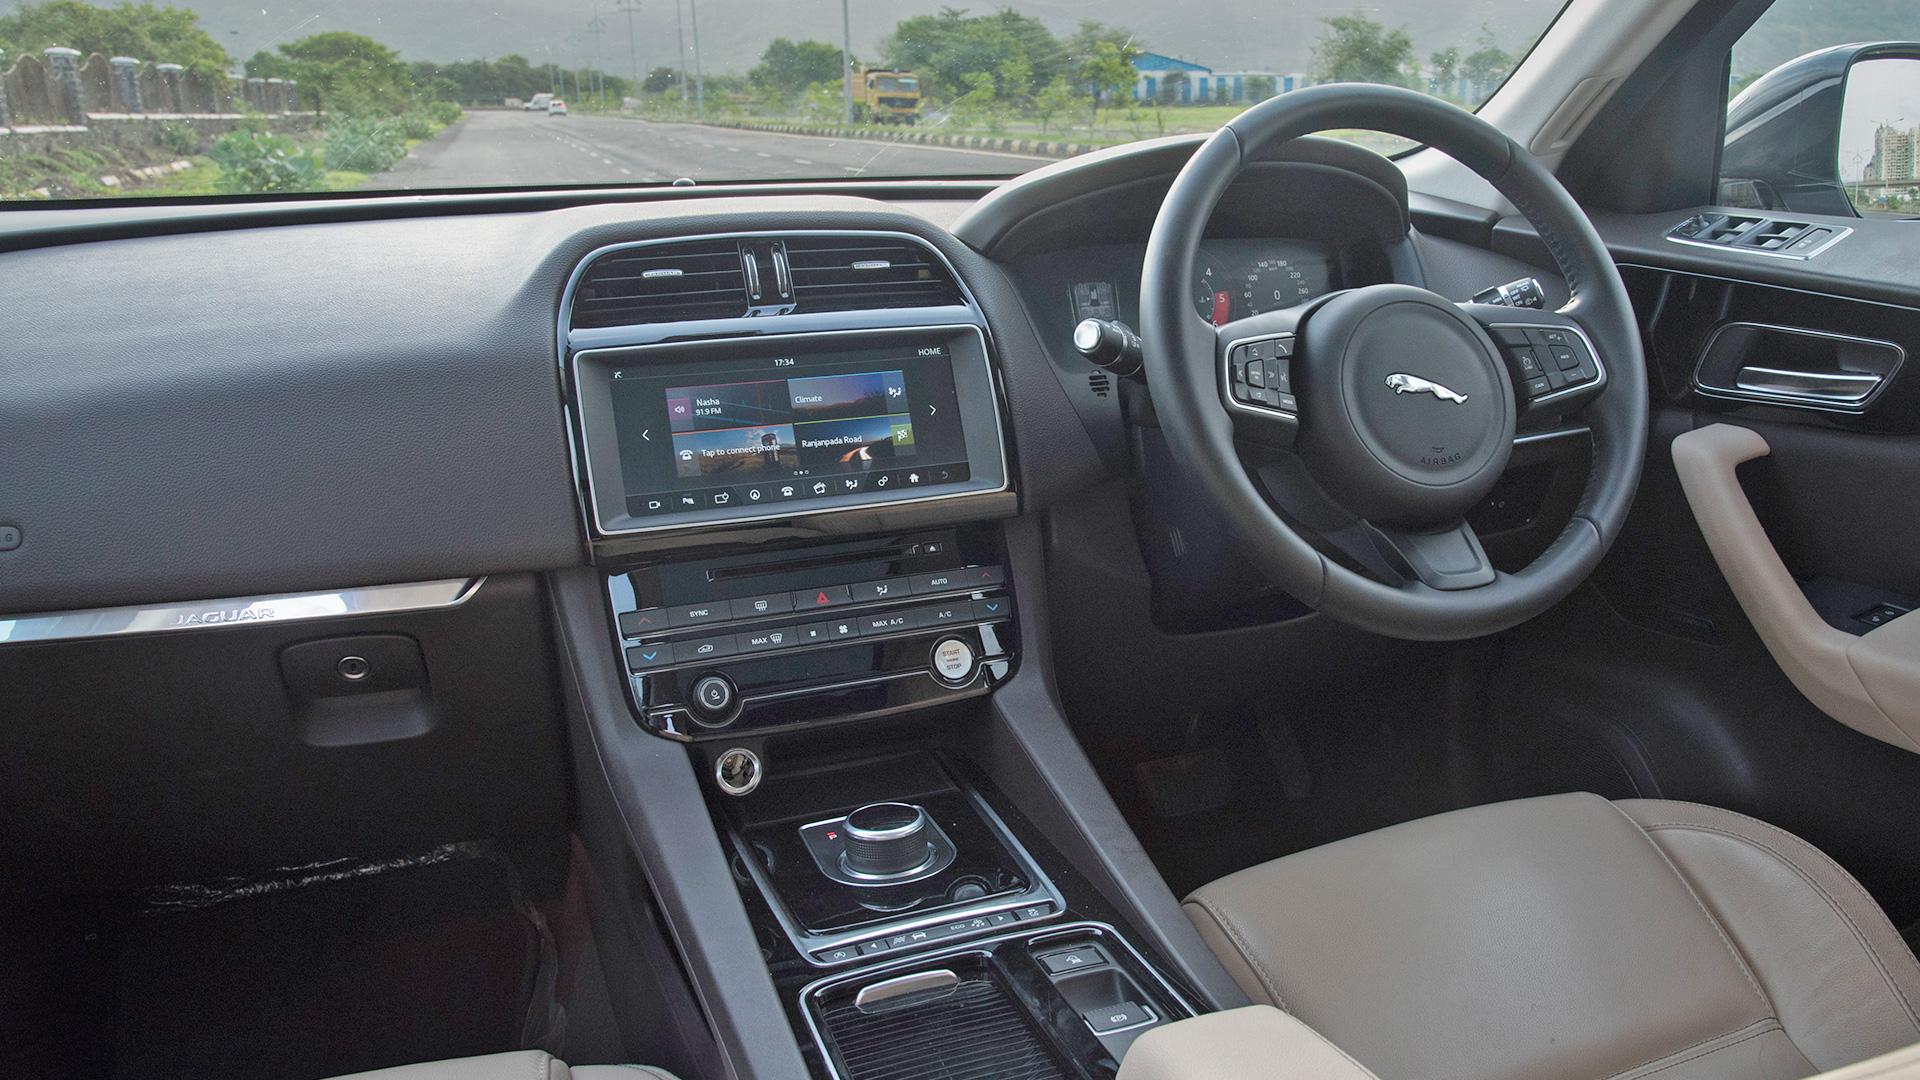 Jaguar F-pace 2016 Prestige Interior Car Photos - Overdrive